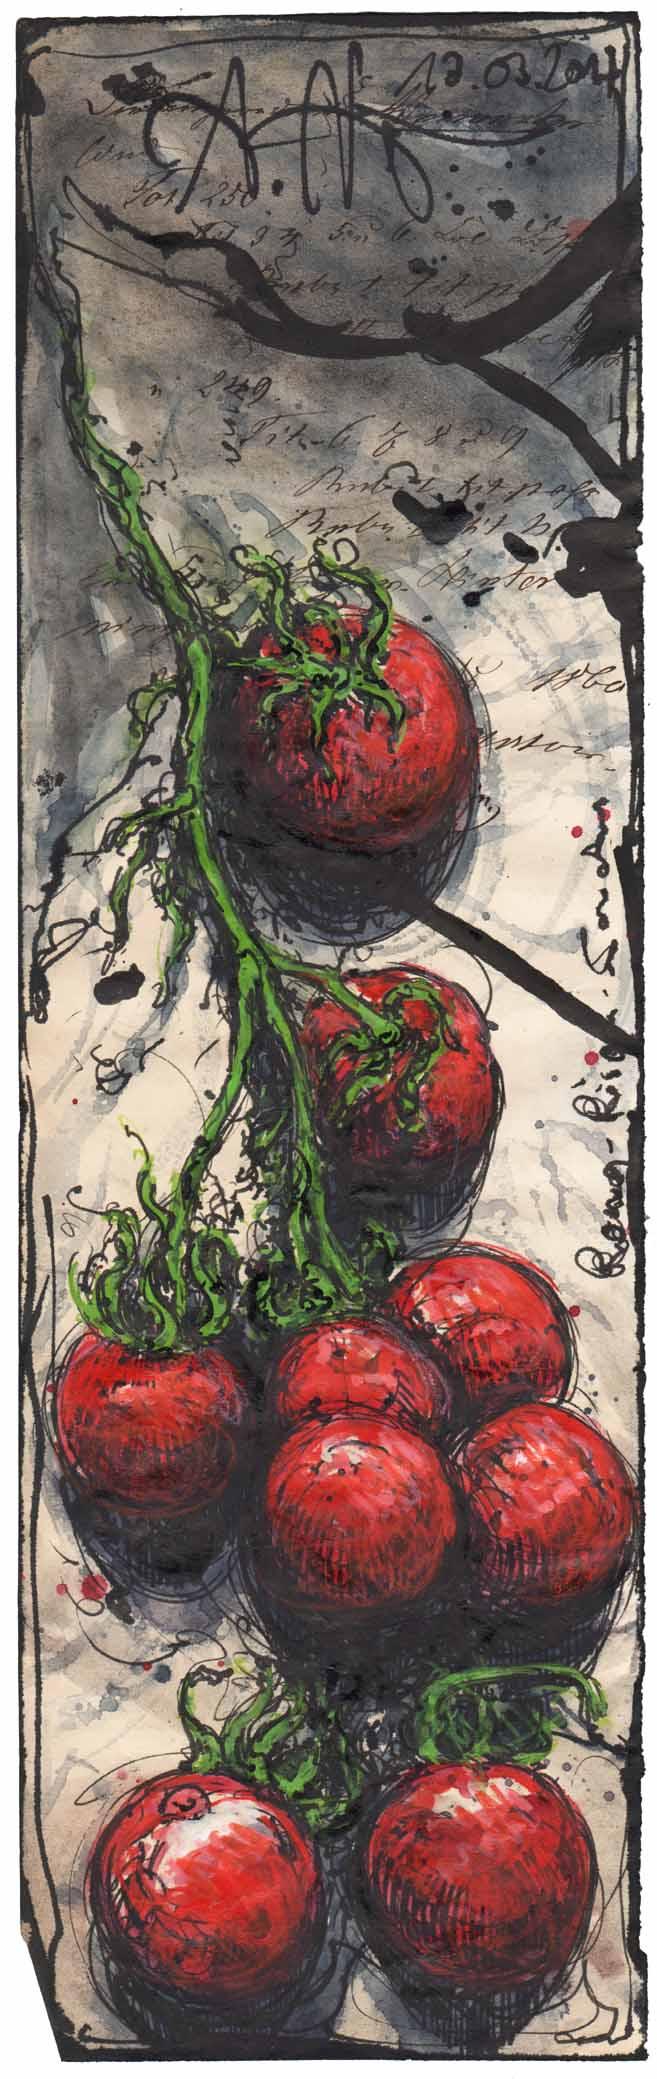 Roma Rispen Tomaten